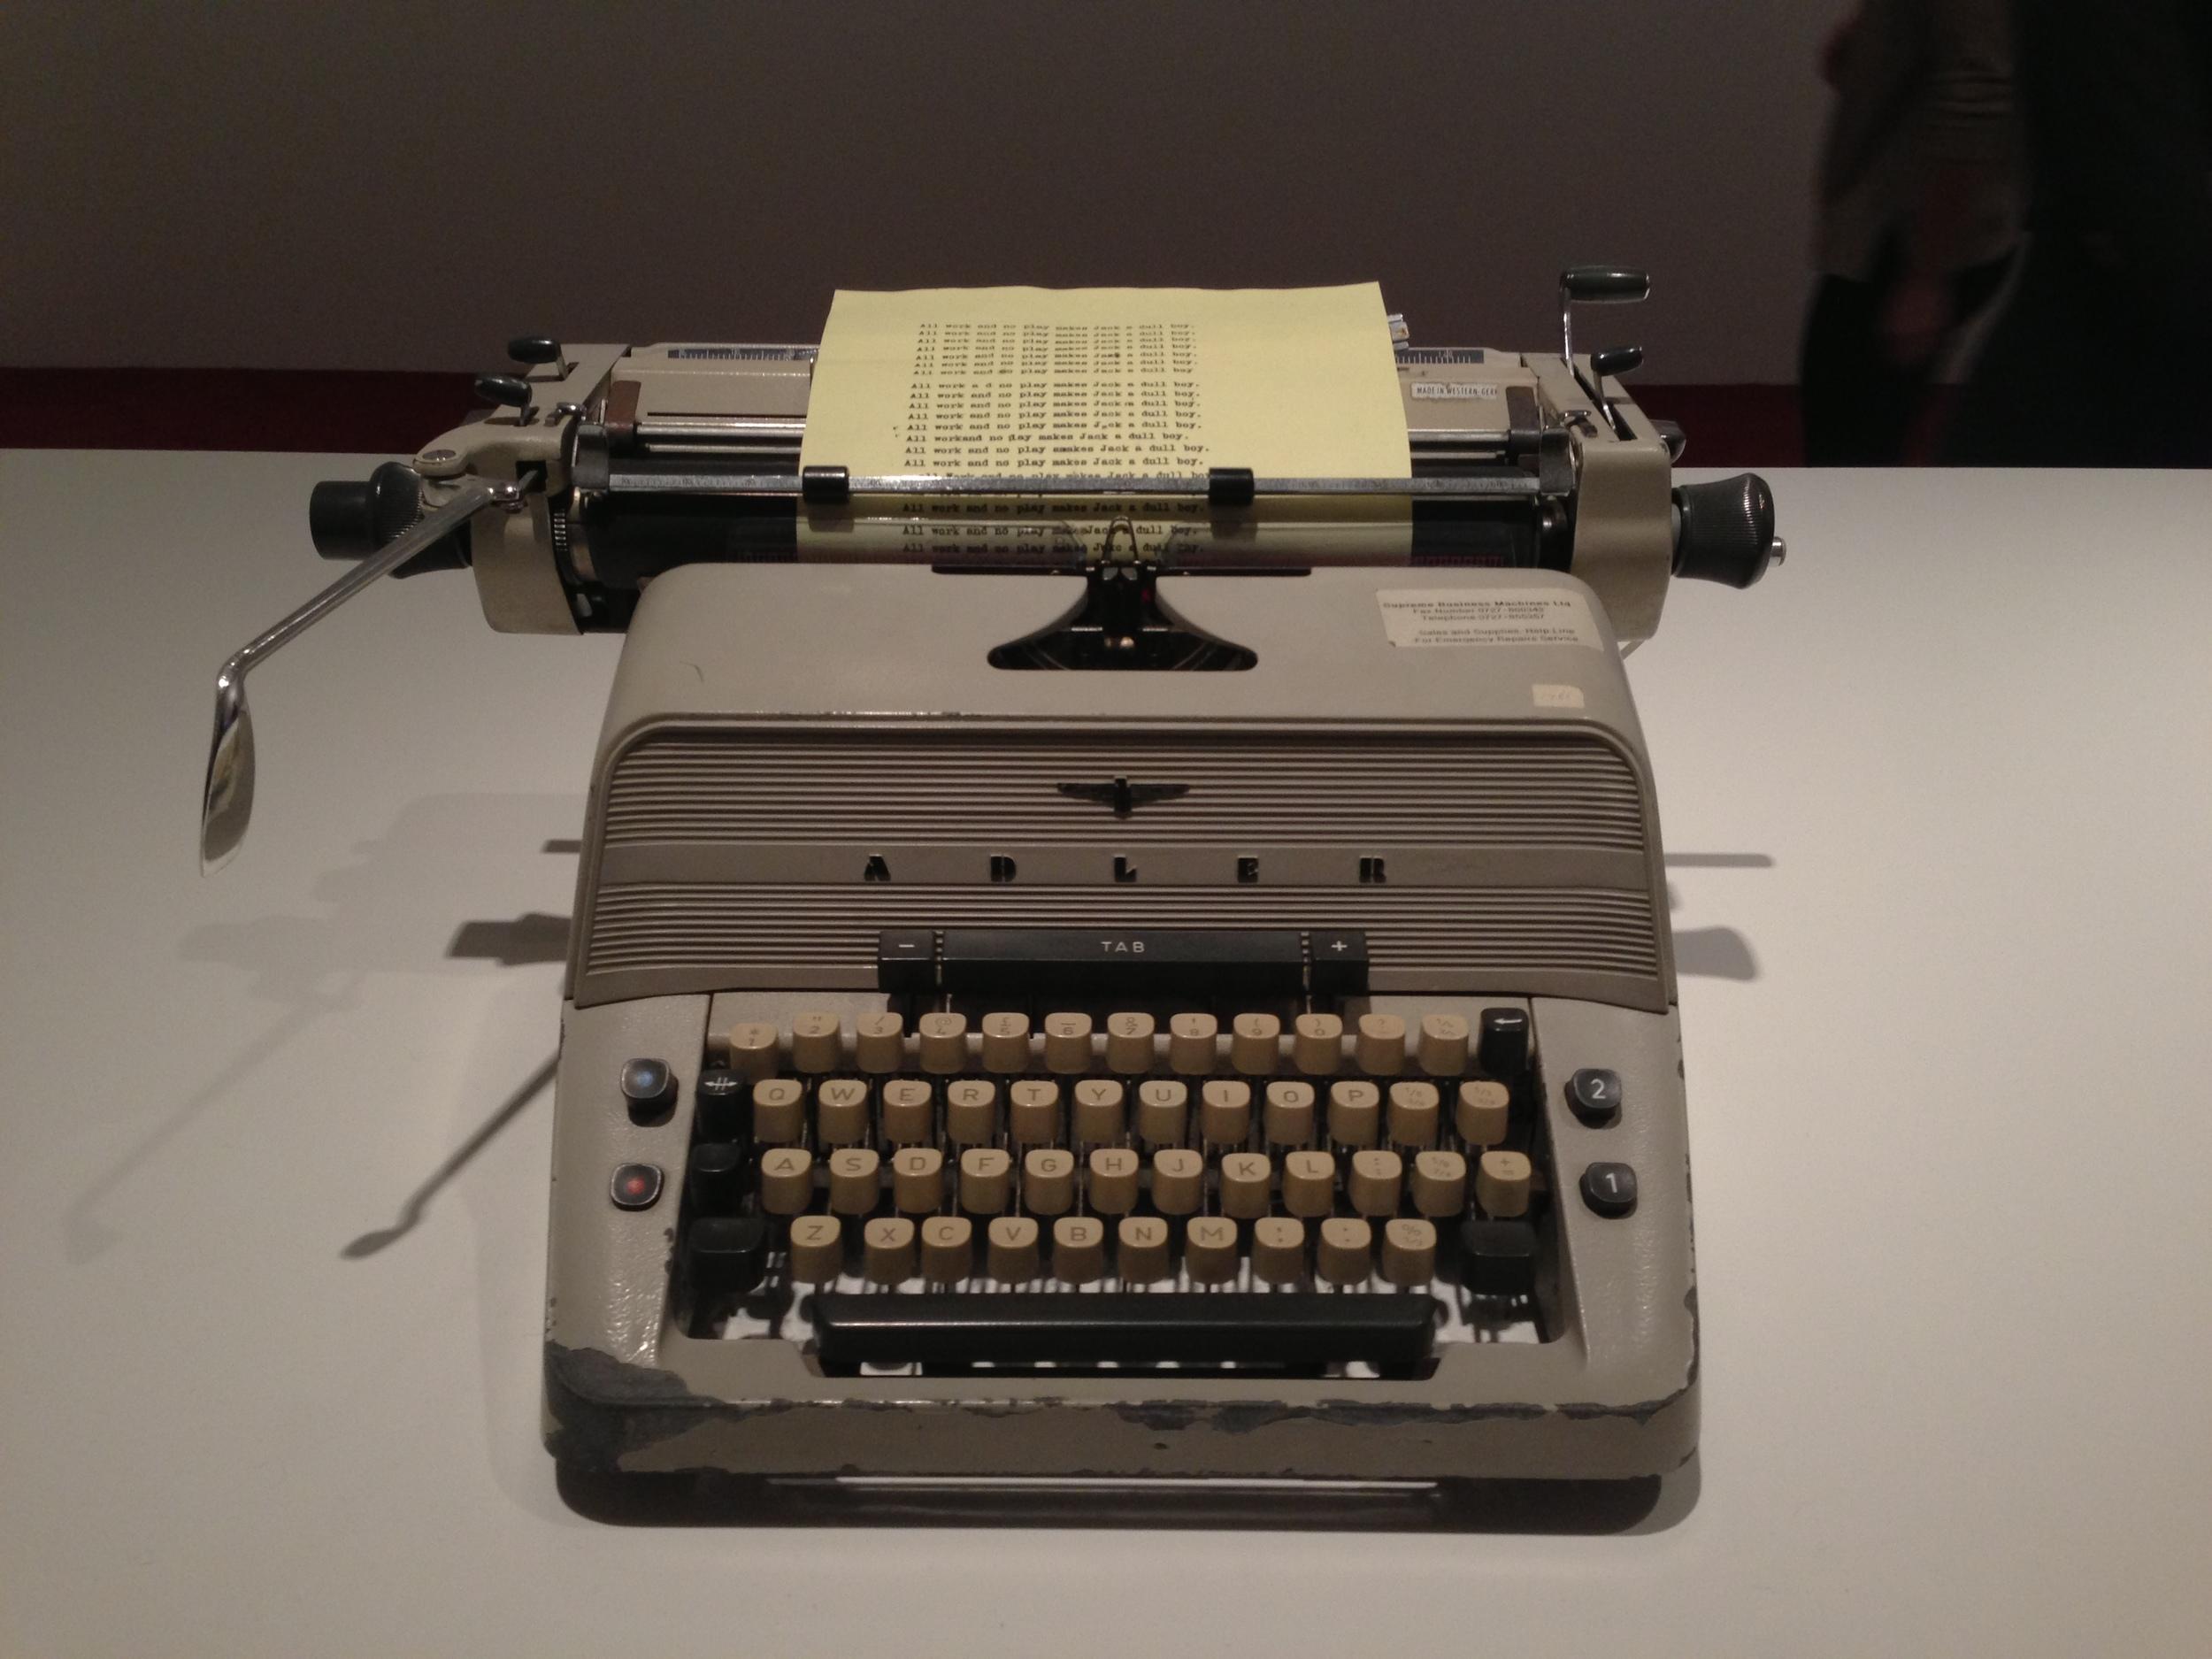 Jack's infamous typewriter